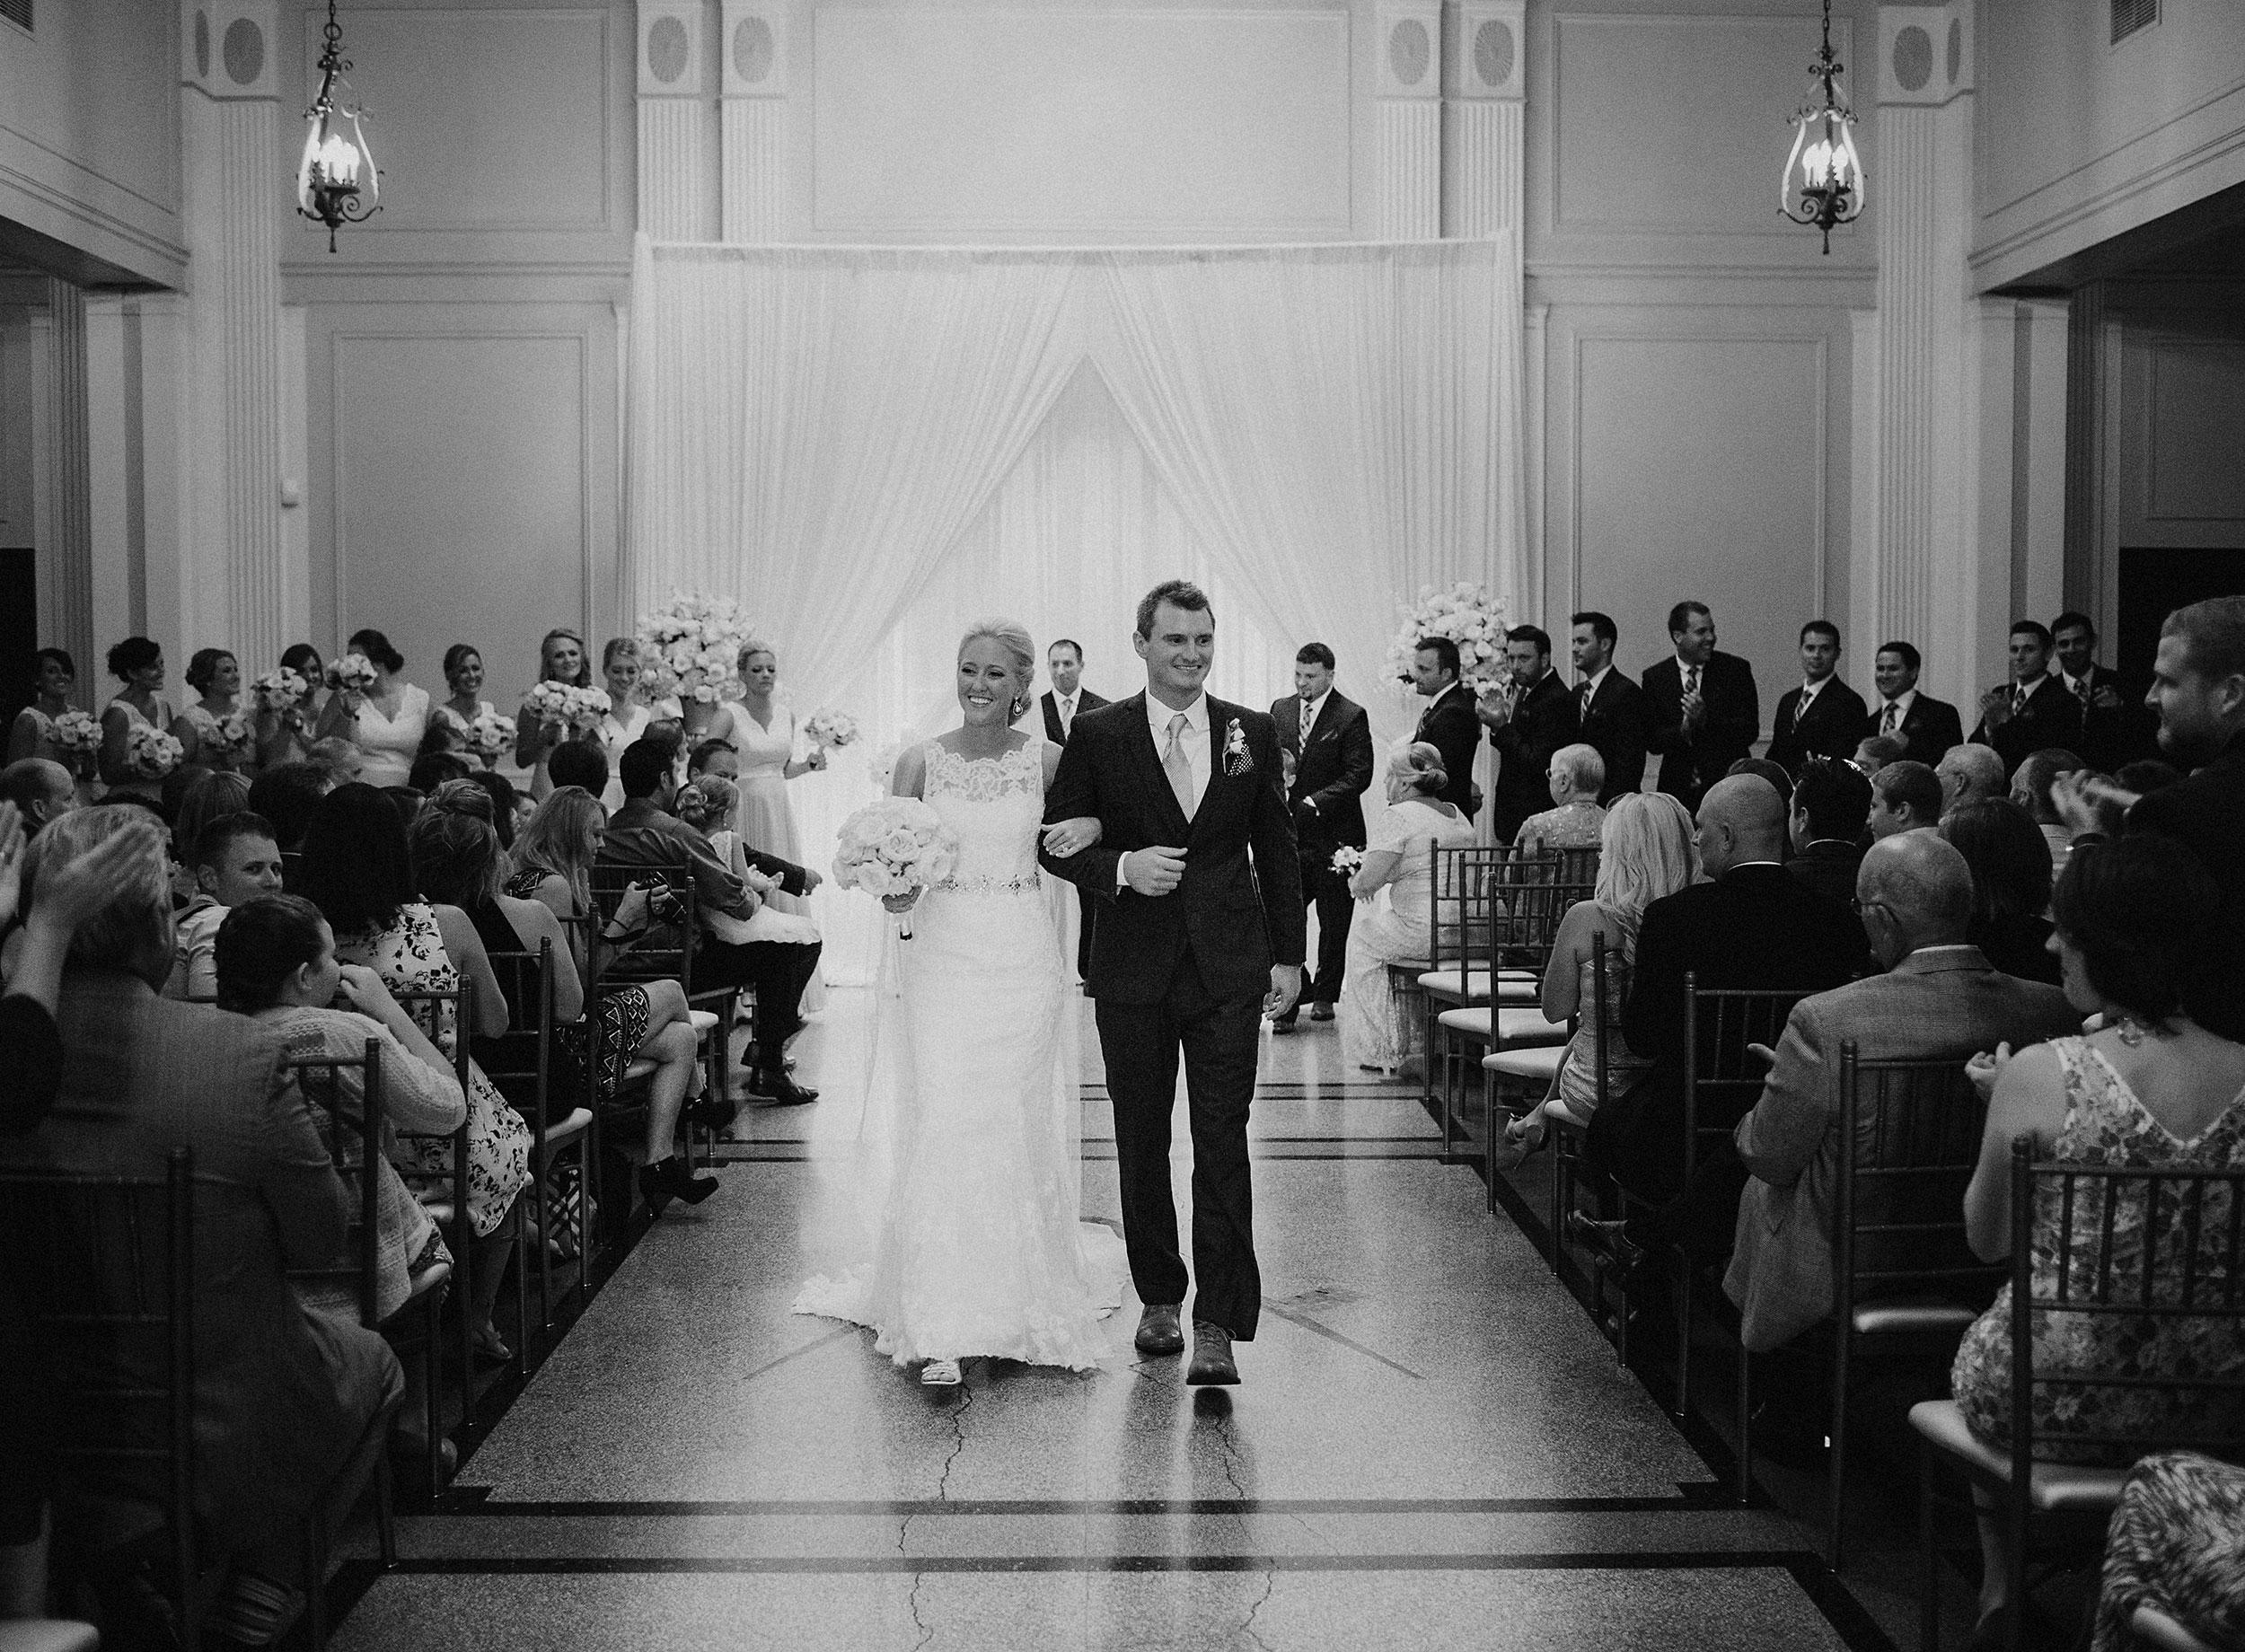 olmsted-wedding-louisville-kentucky-031.JPG